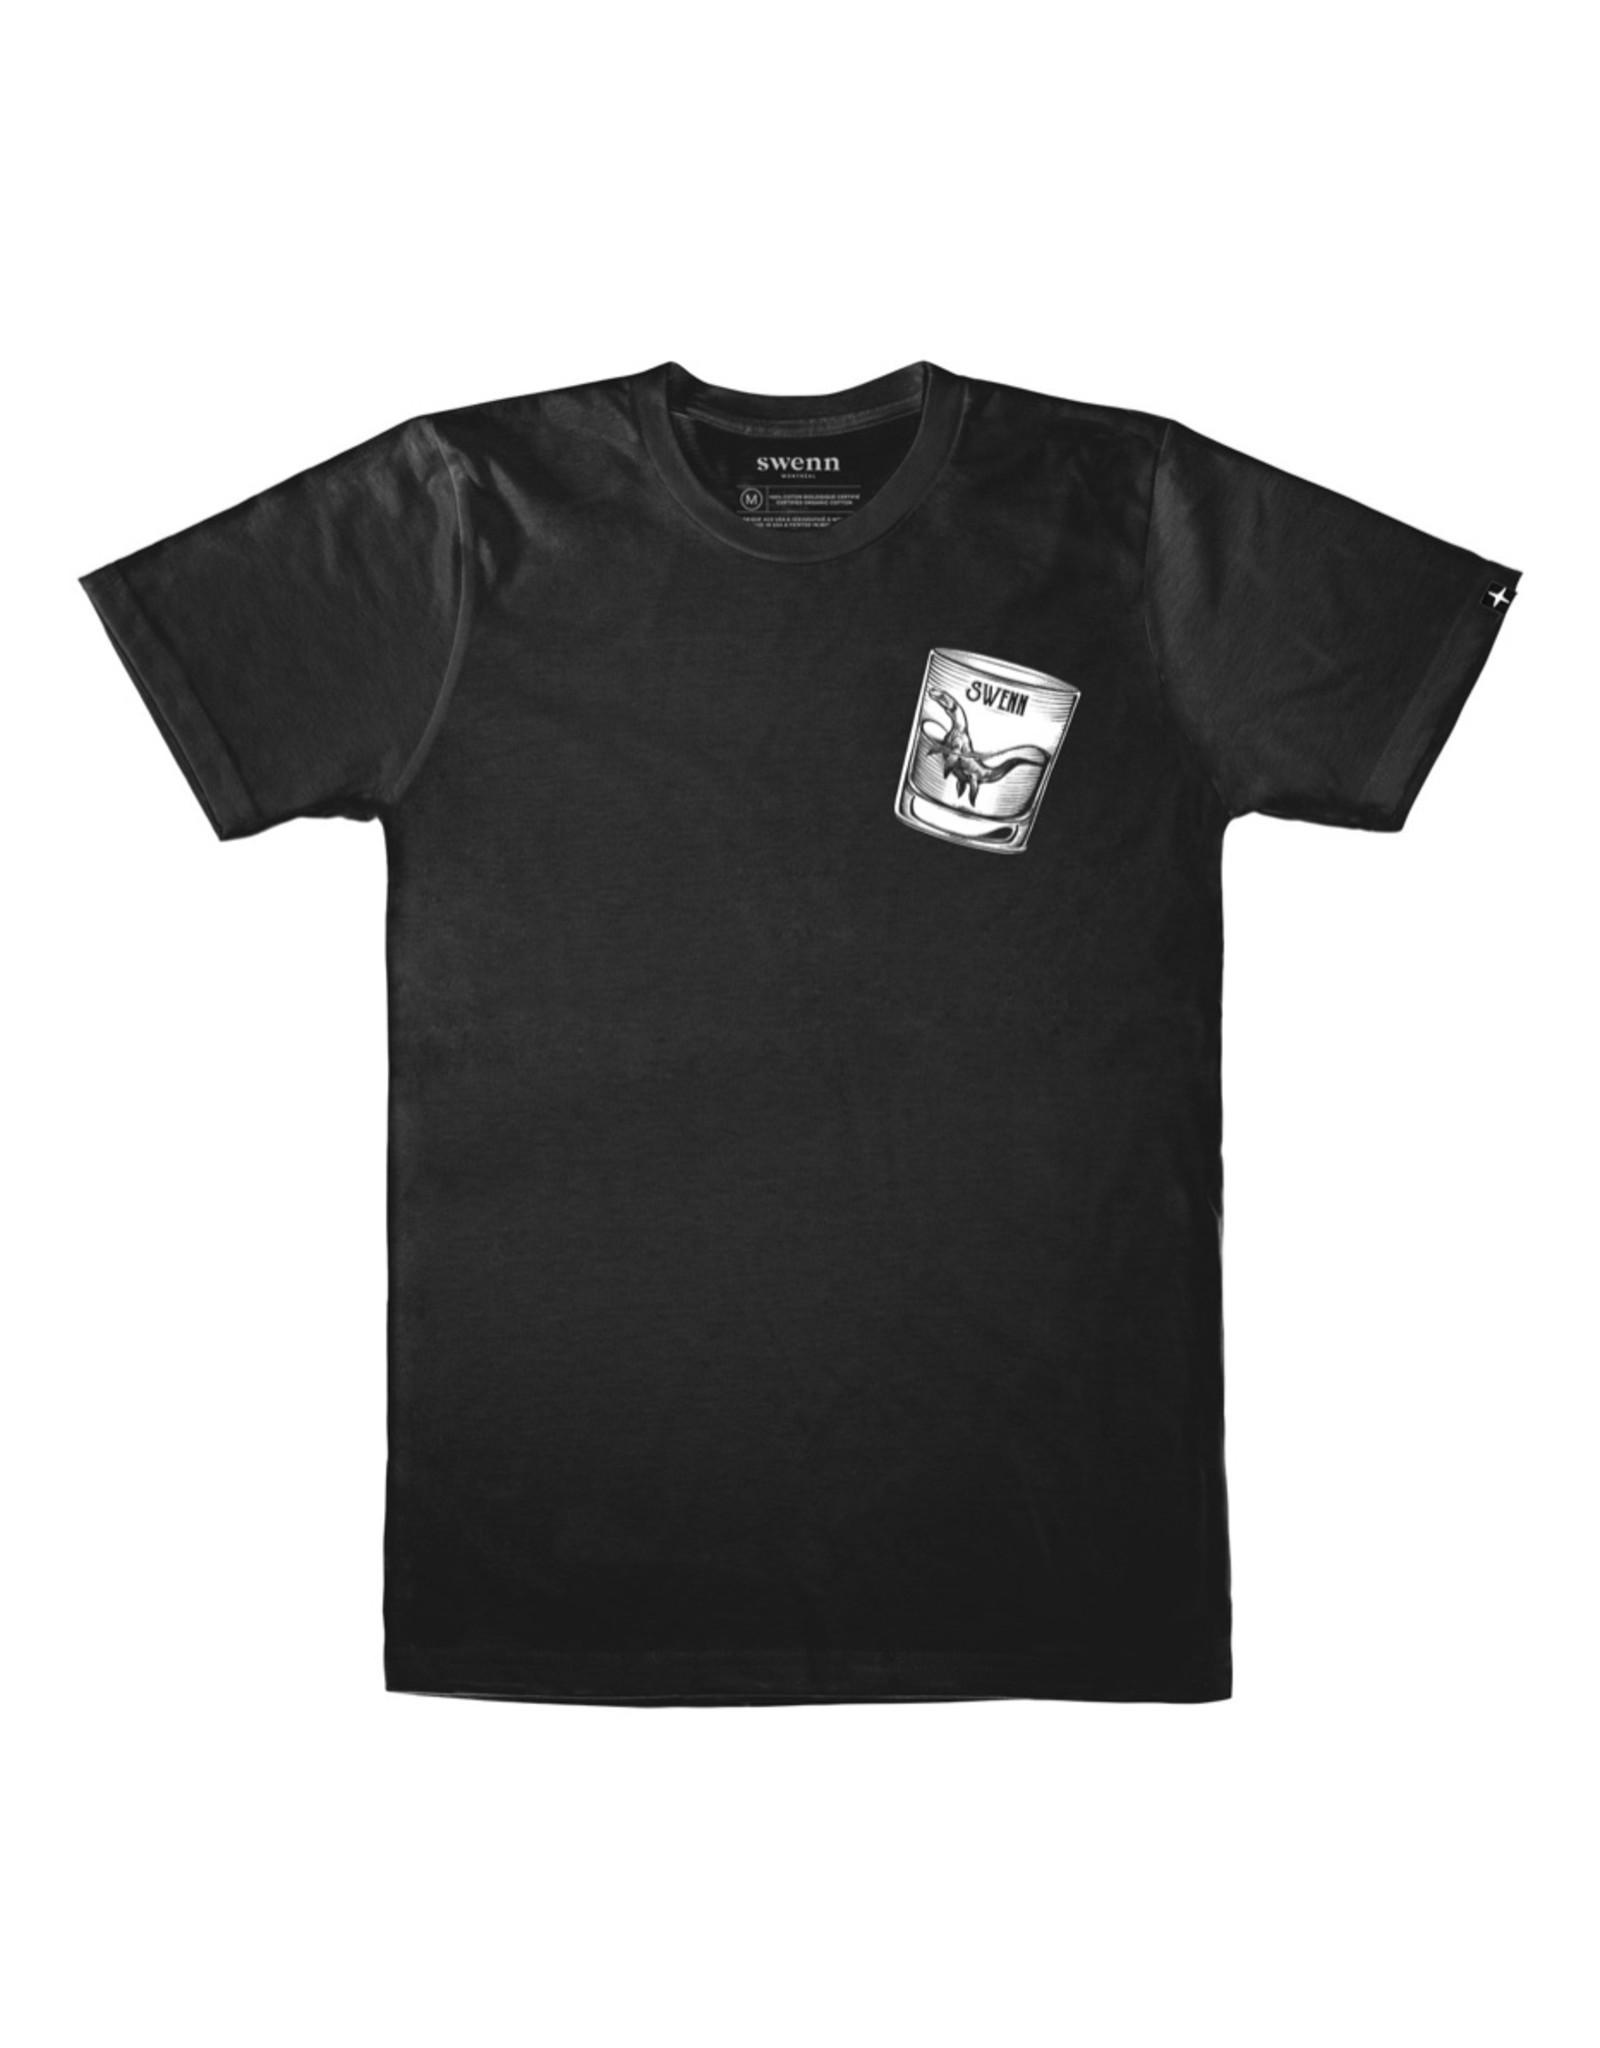 Swenn T-shirt unisexe dinosaure noir